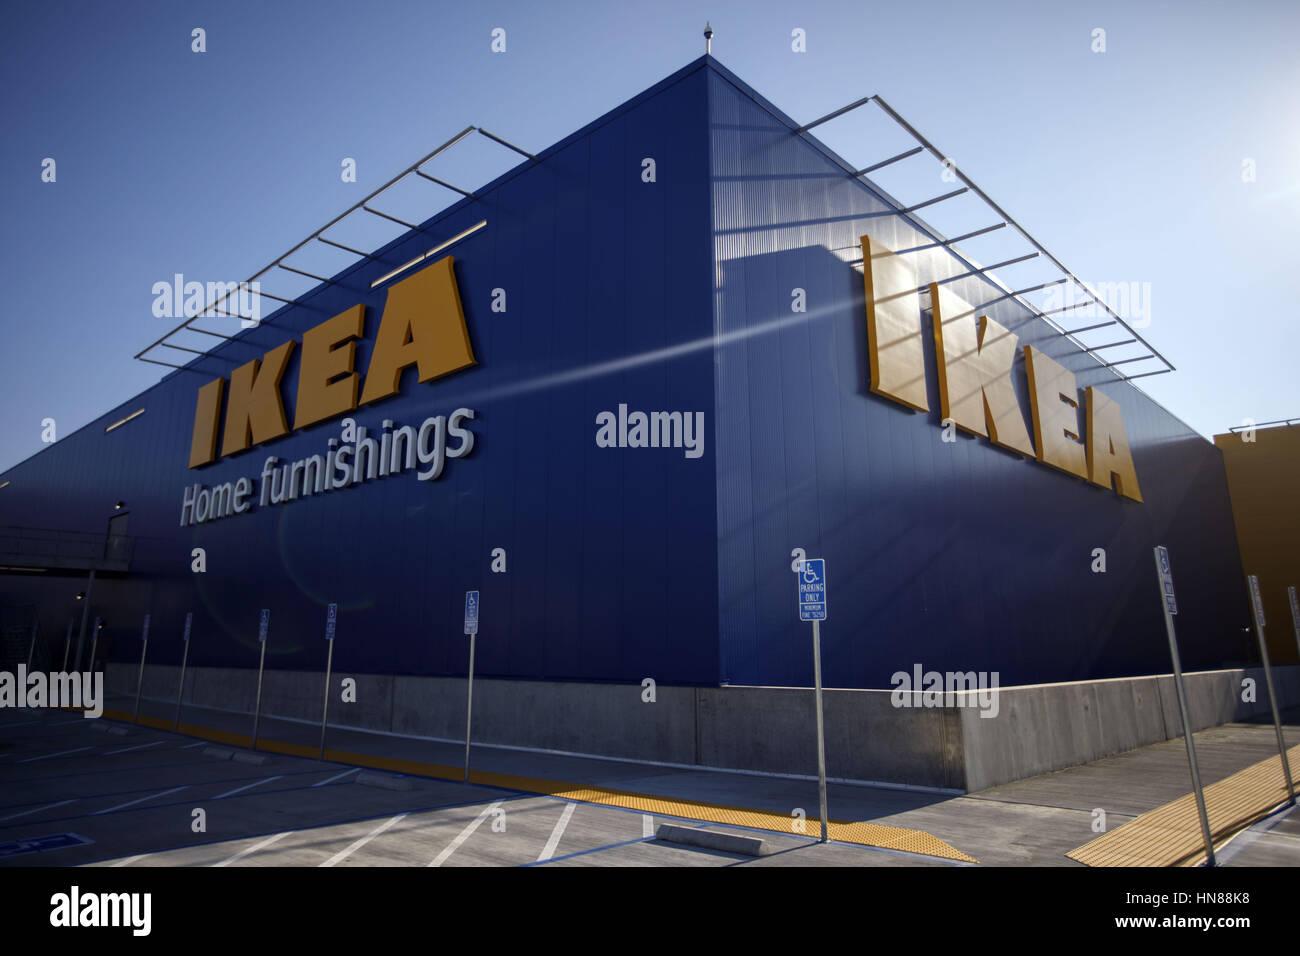 Burbank, CA, USA. 1st Feb, 2017. The IKEA Logo Is Displayed Outside The New  IKEA Burbank Home Furnishings Store On Wednesday, February 1, 2017 In  Burbank, ...